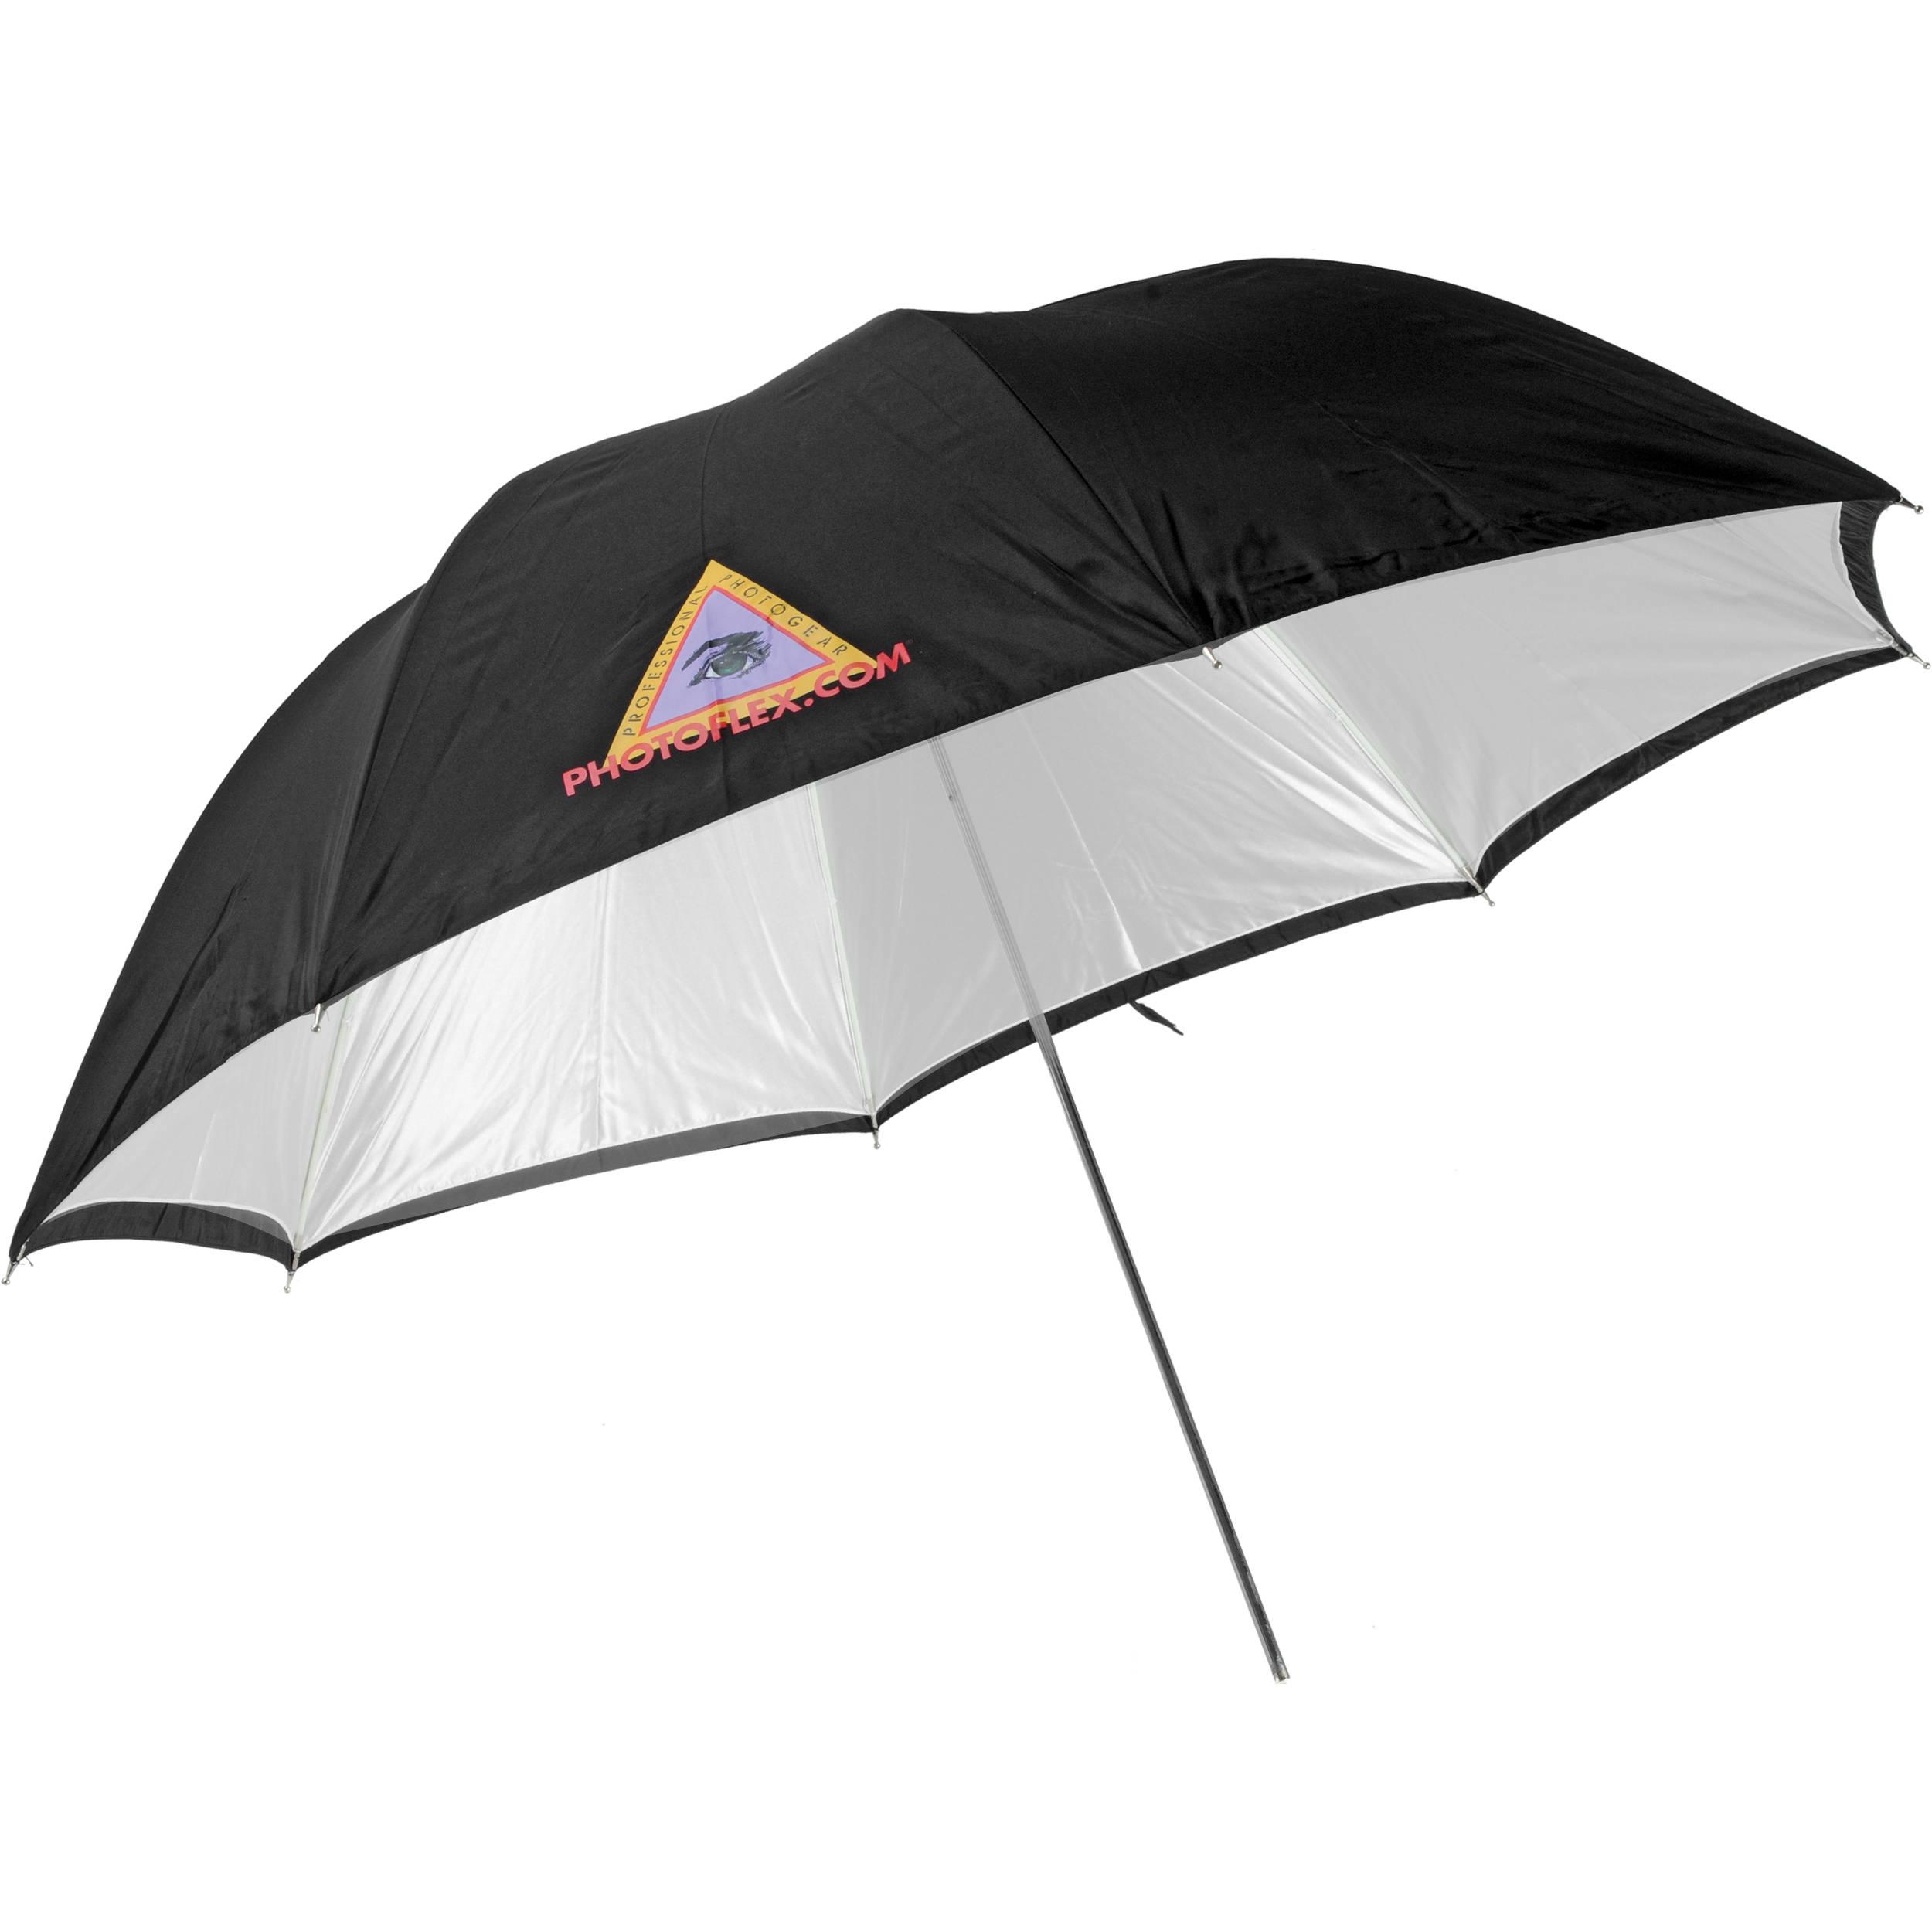 2500x2500 Photoflex 45 Convertible Umbrella (White) 871090 Bamph Photo